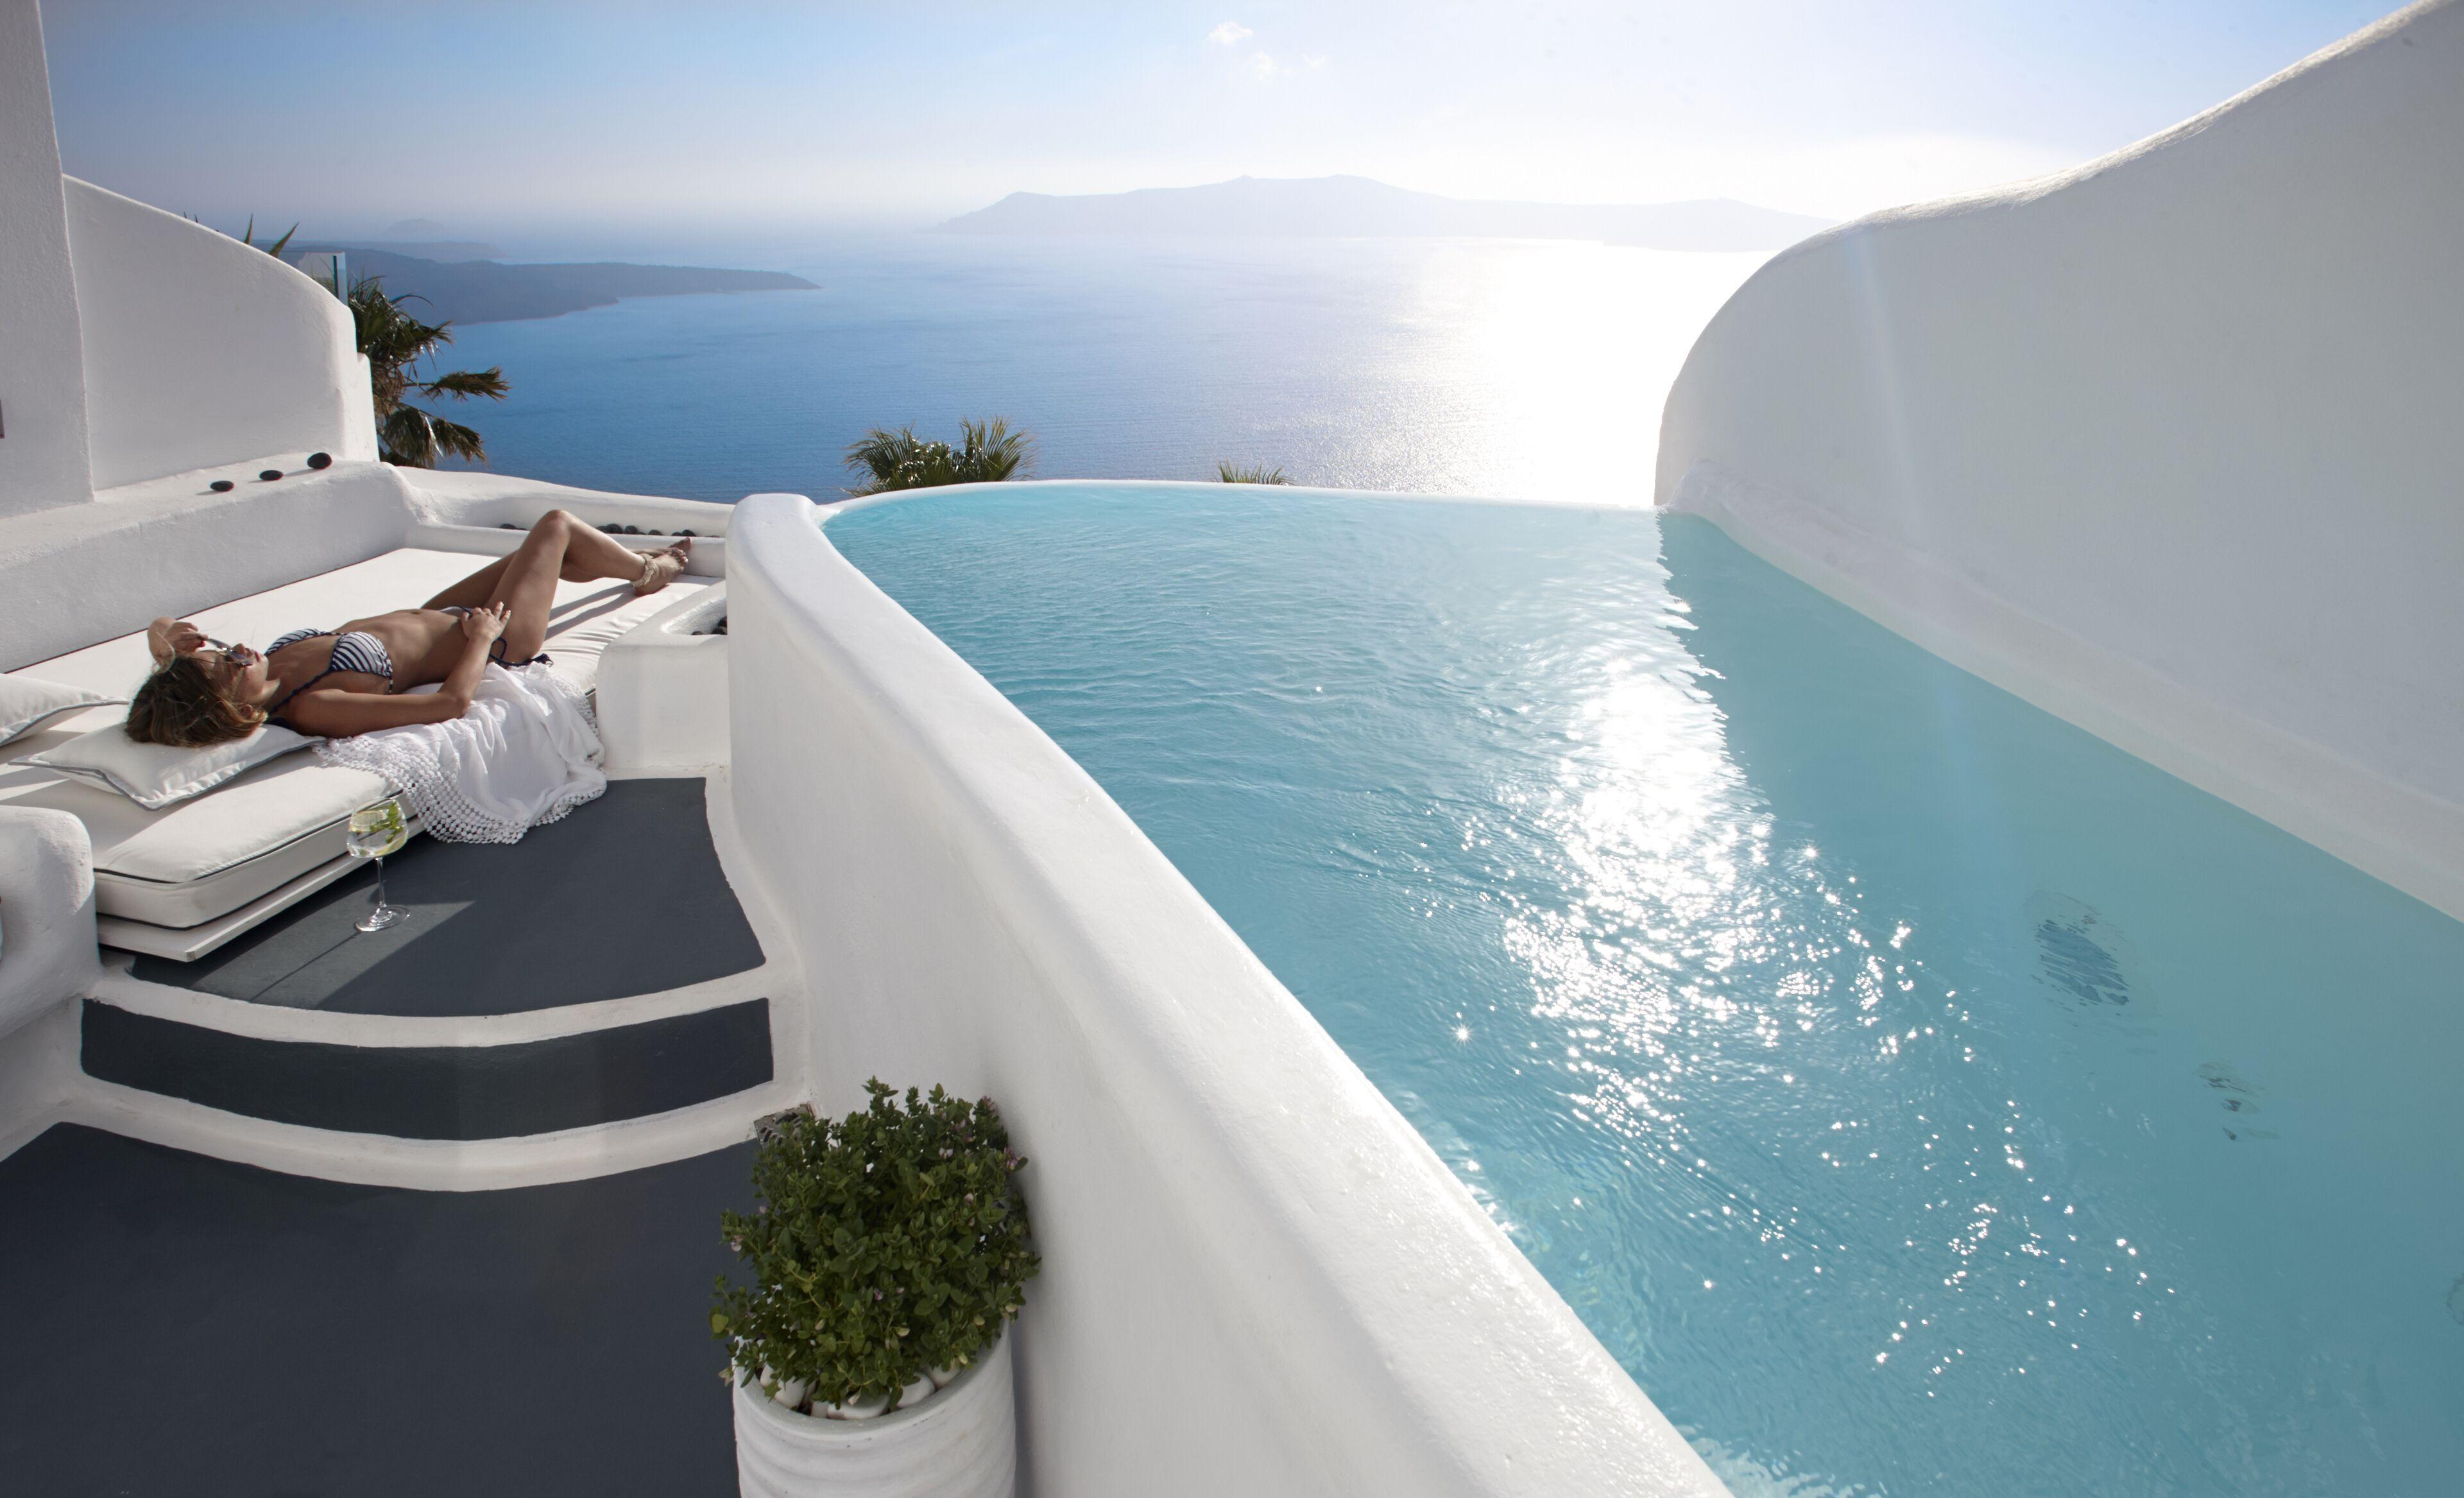 Infinity Suites And Dana Villas